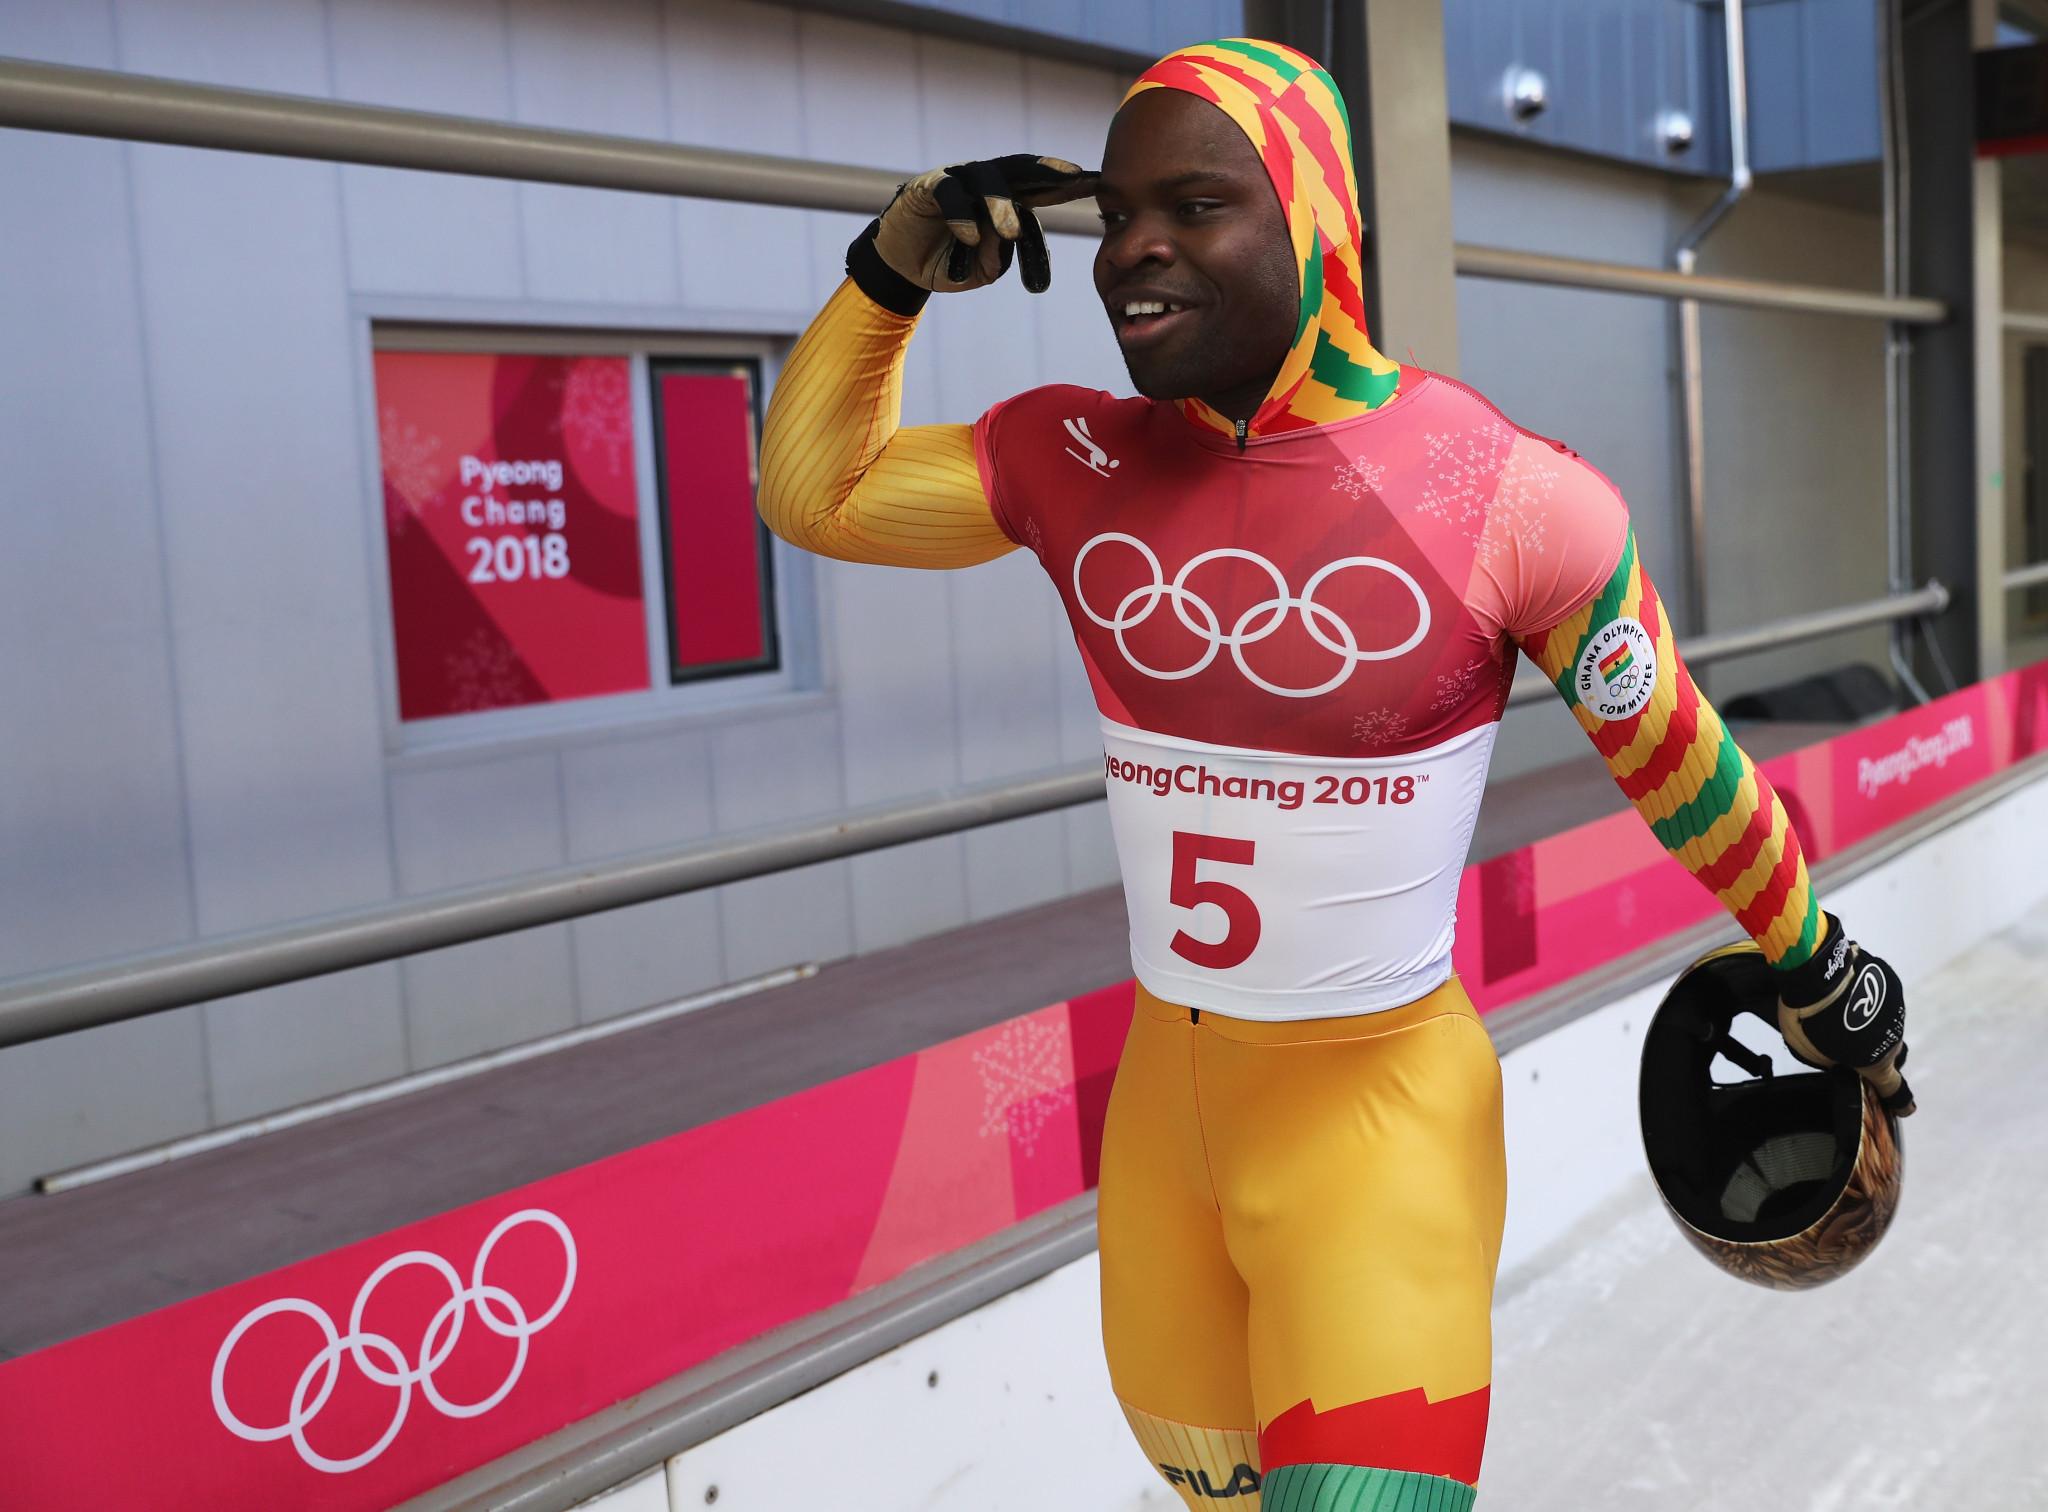 Akwasi Frimpong represented Ghana in skeleton at Pyeongchang 2018 ©Getty Images